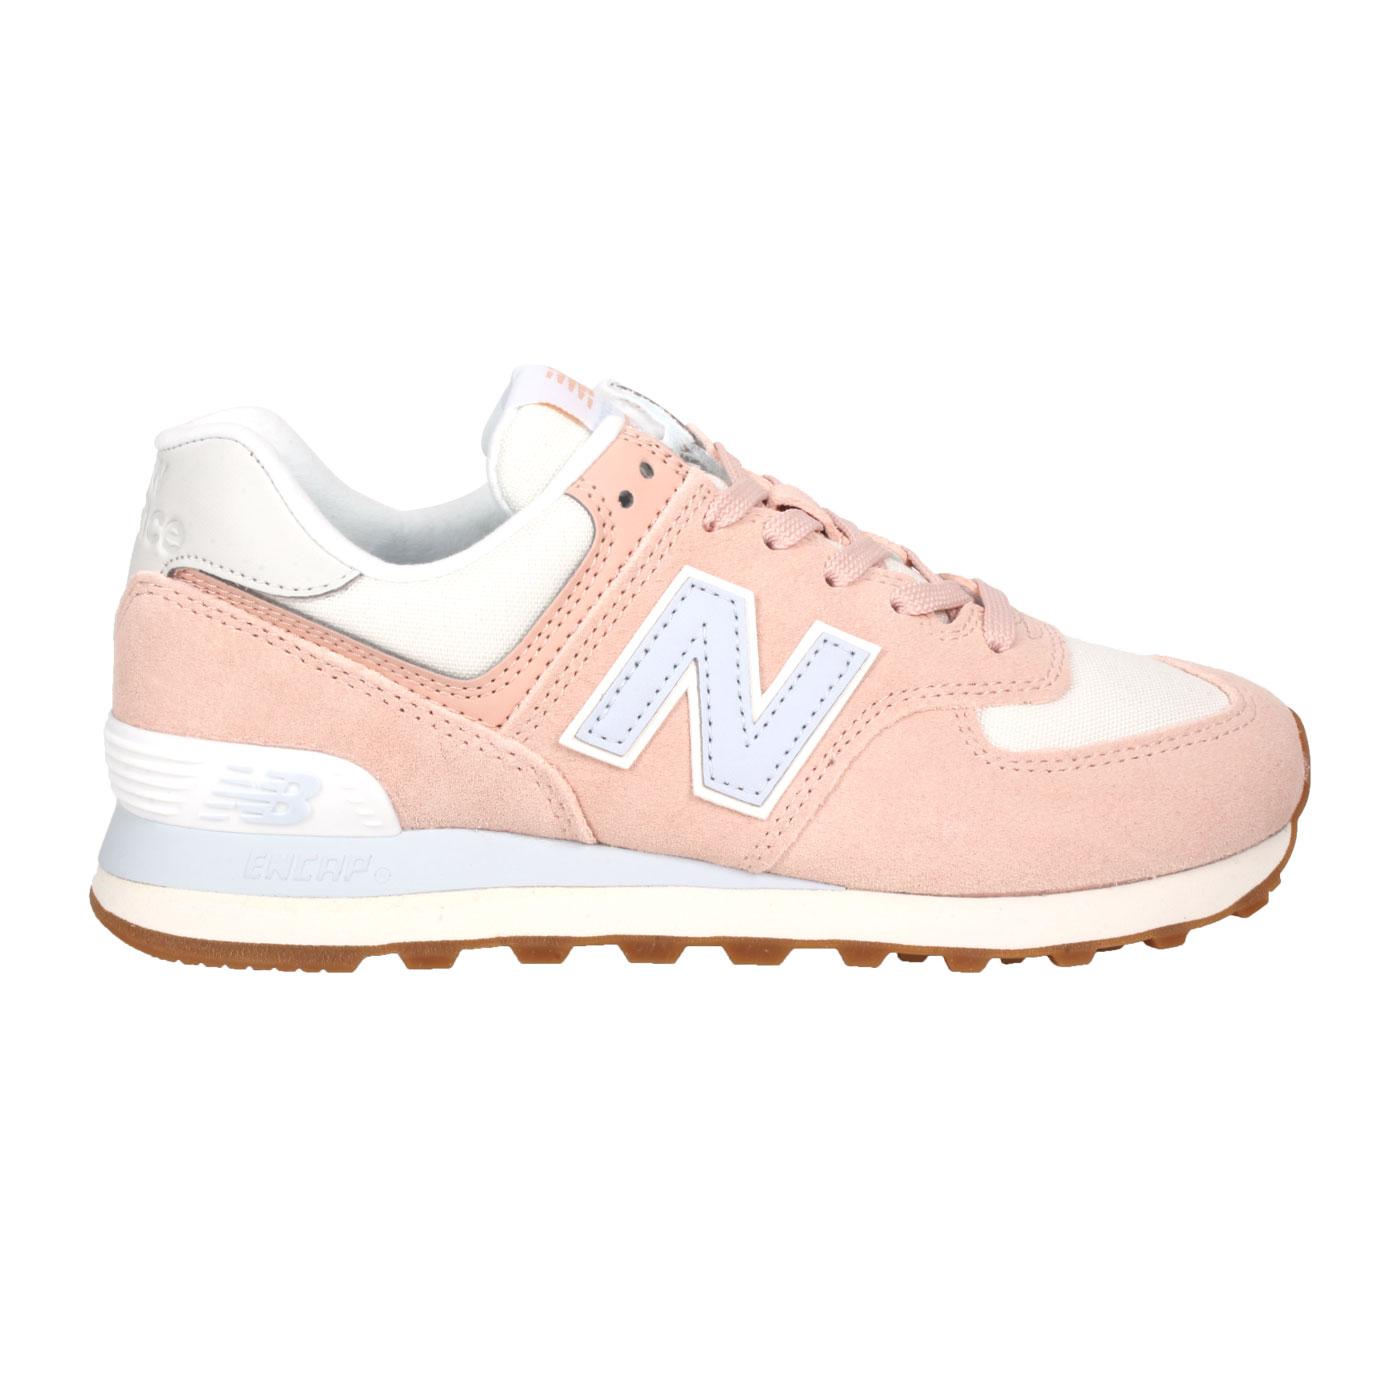 NEW BALANCE 女款運動休閒鞋 WL574NE2 - 粉紫灰